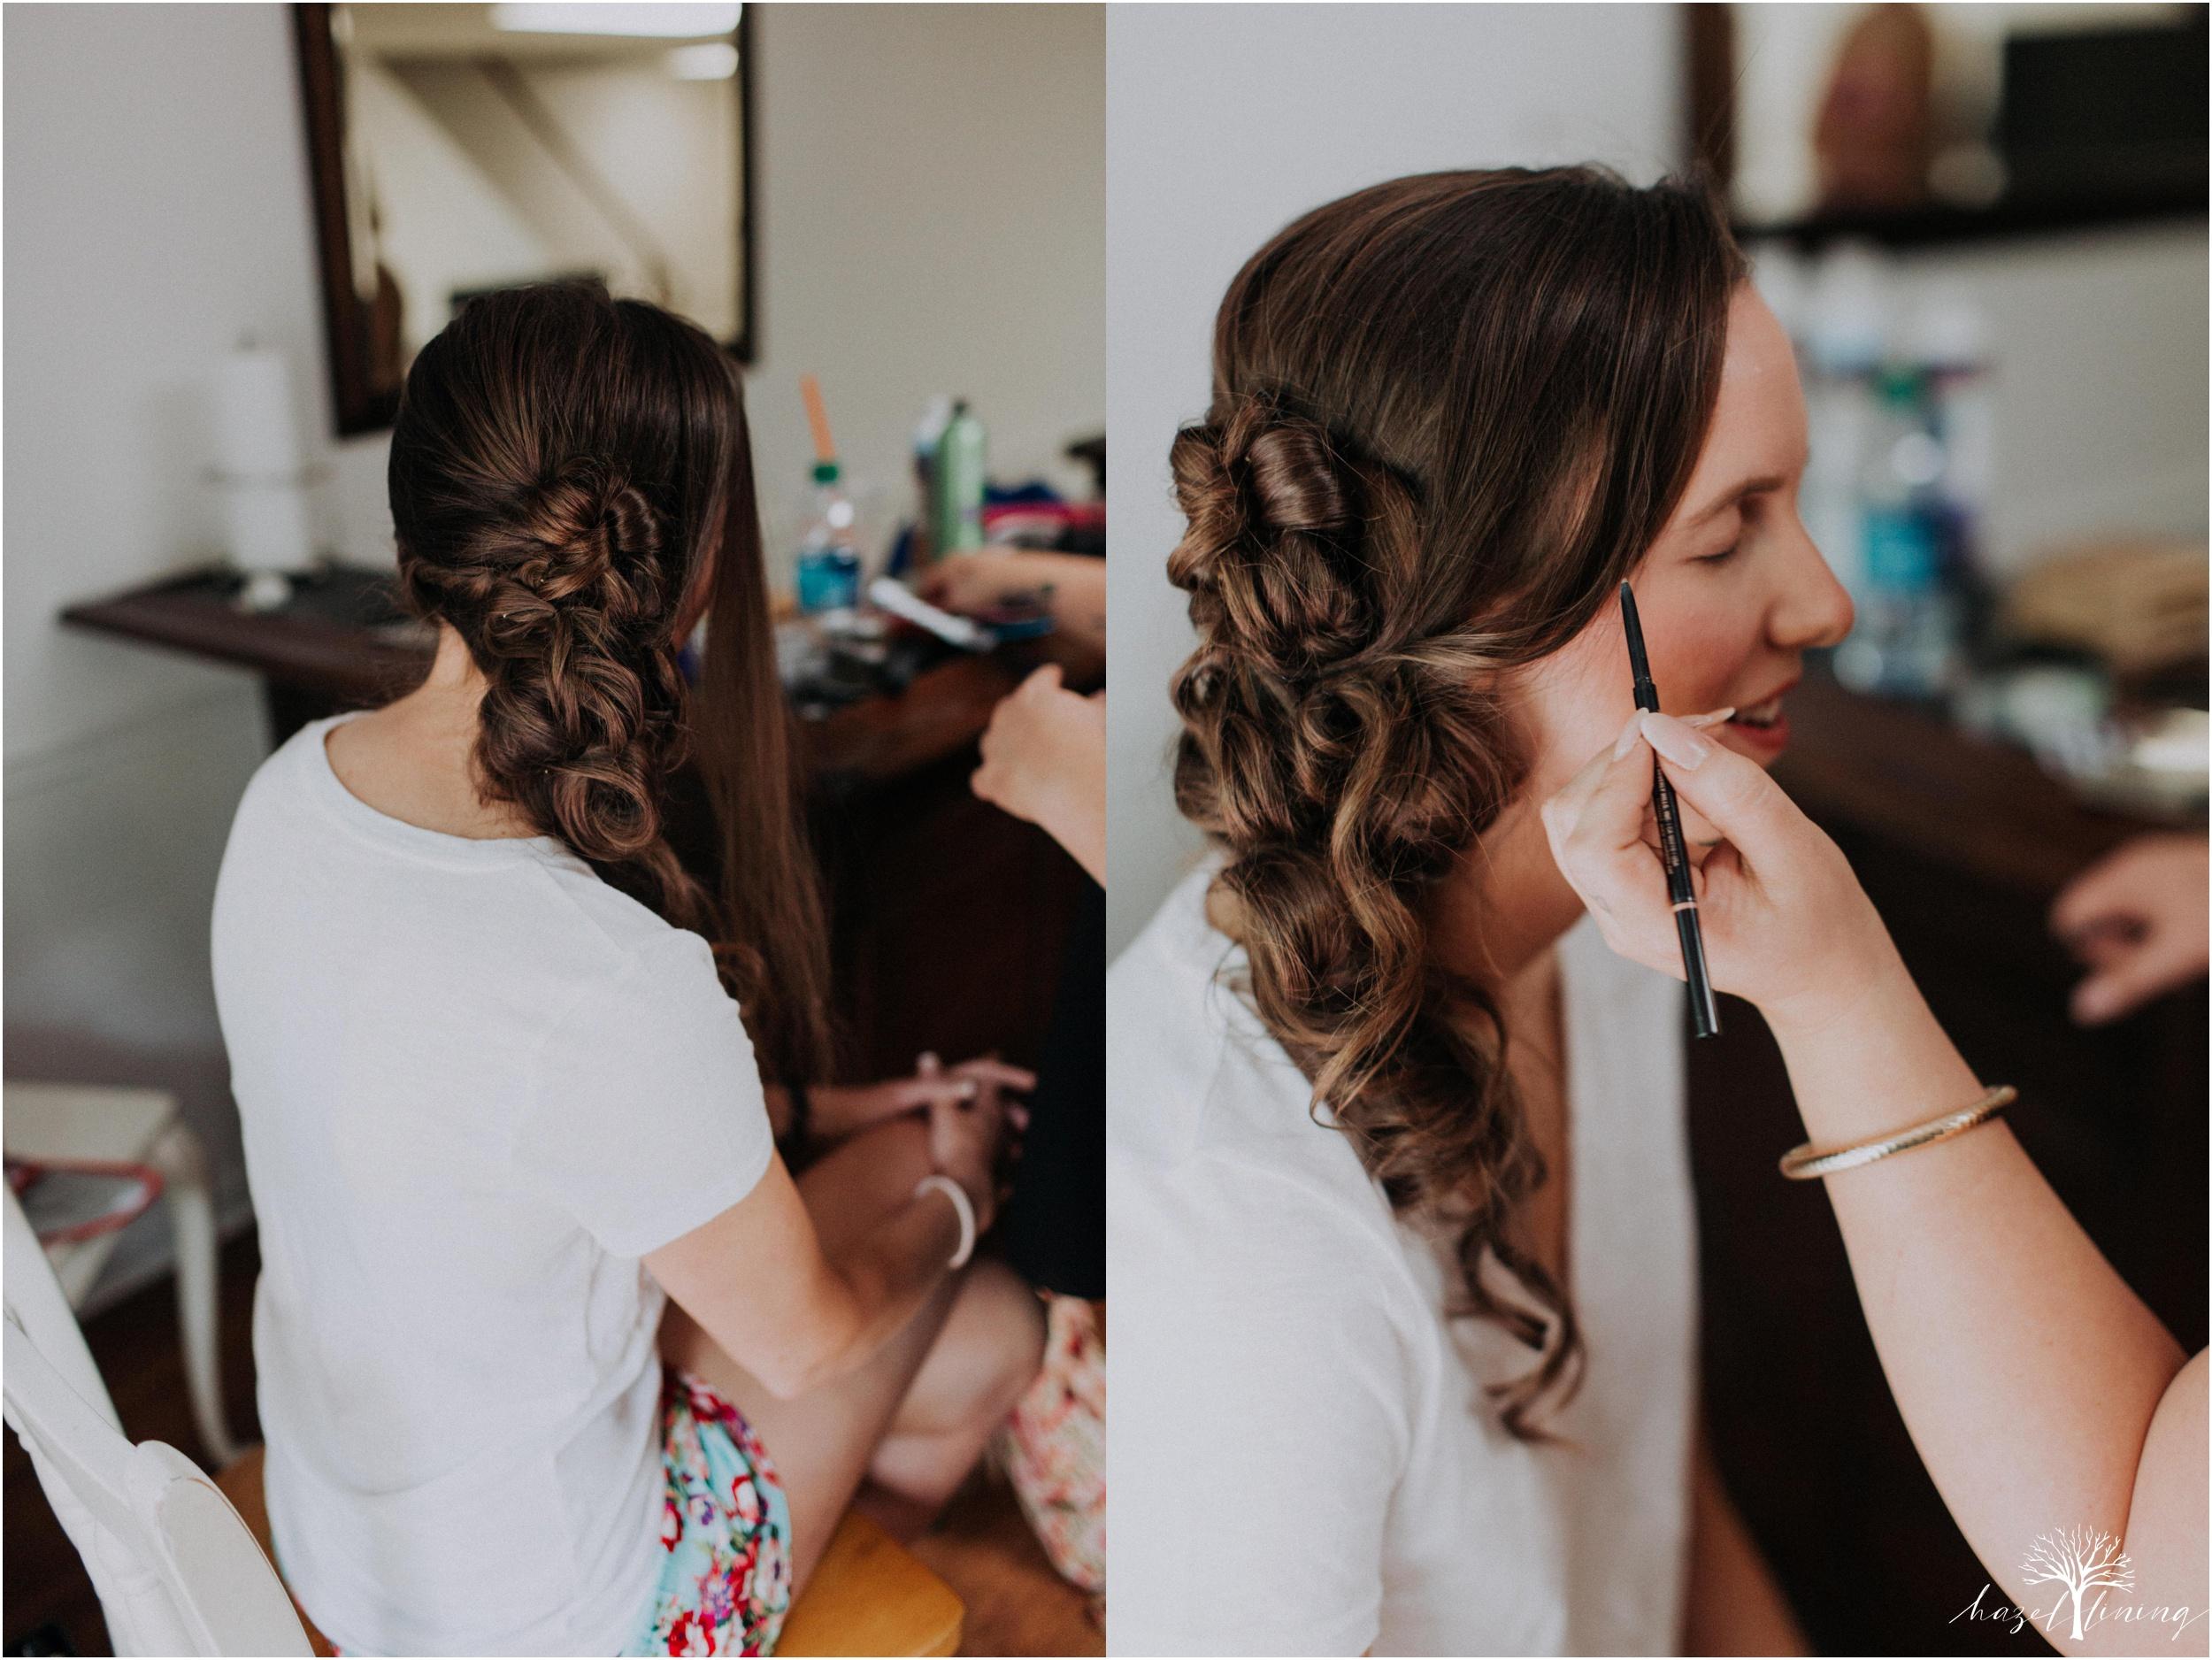 hazel-lining-travel-wedding-elopement-photography_0010.jpg